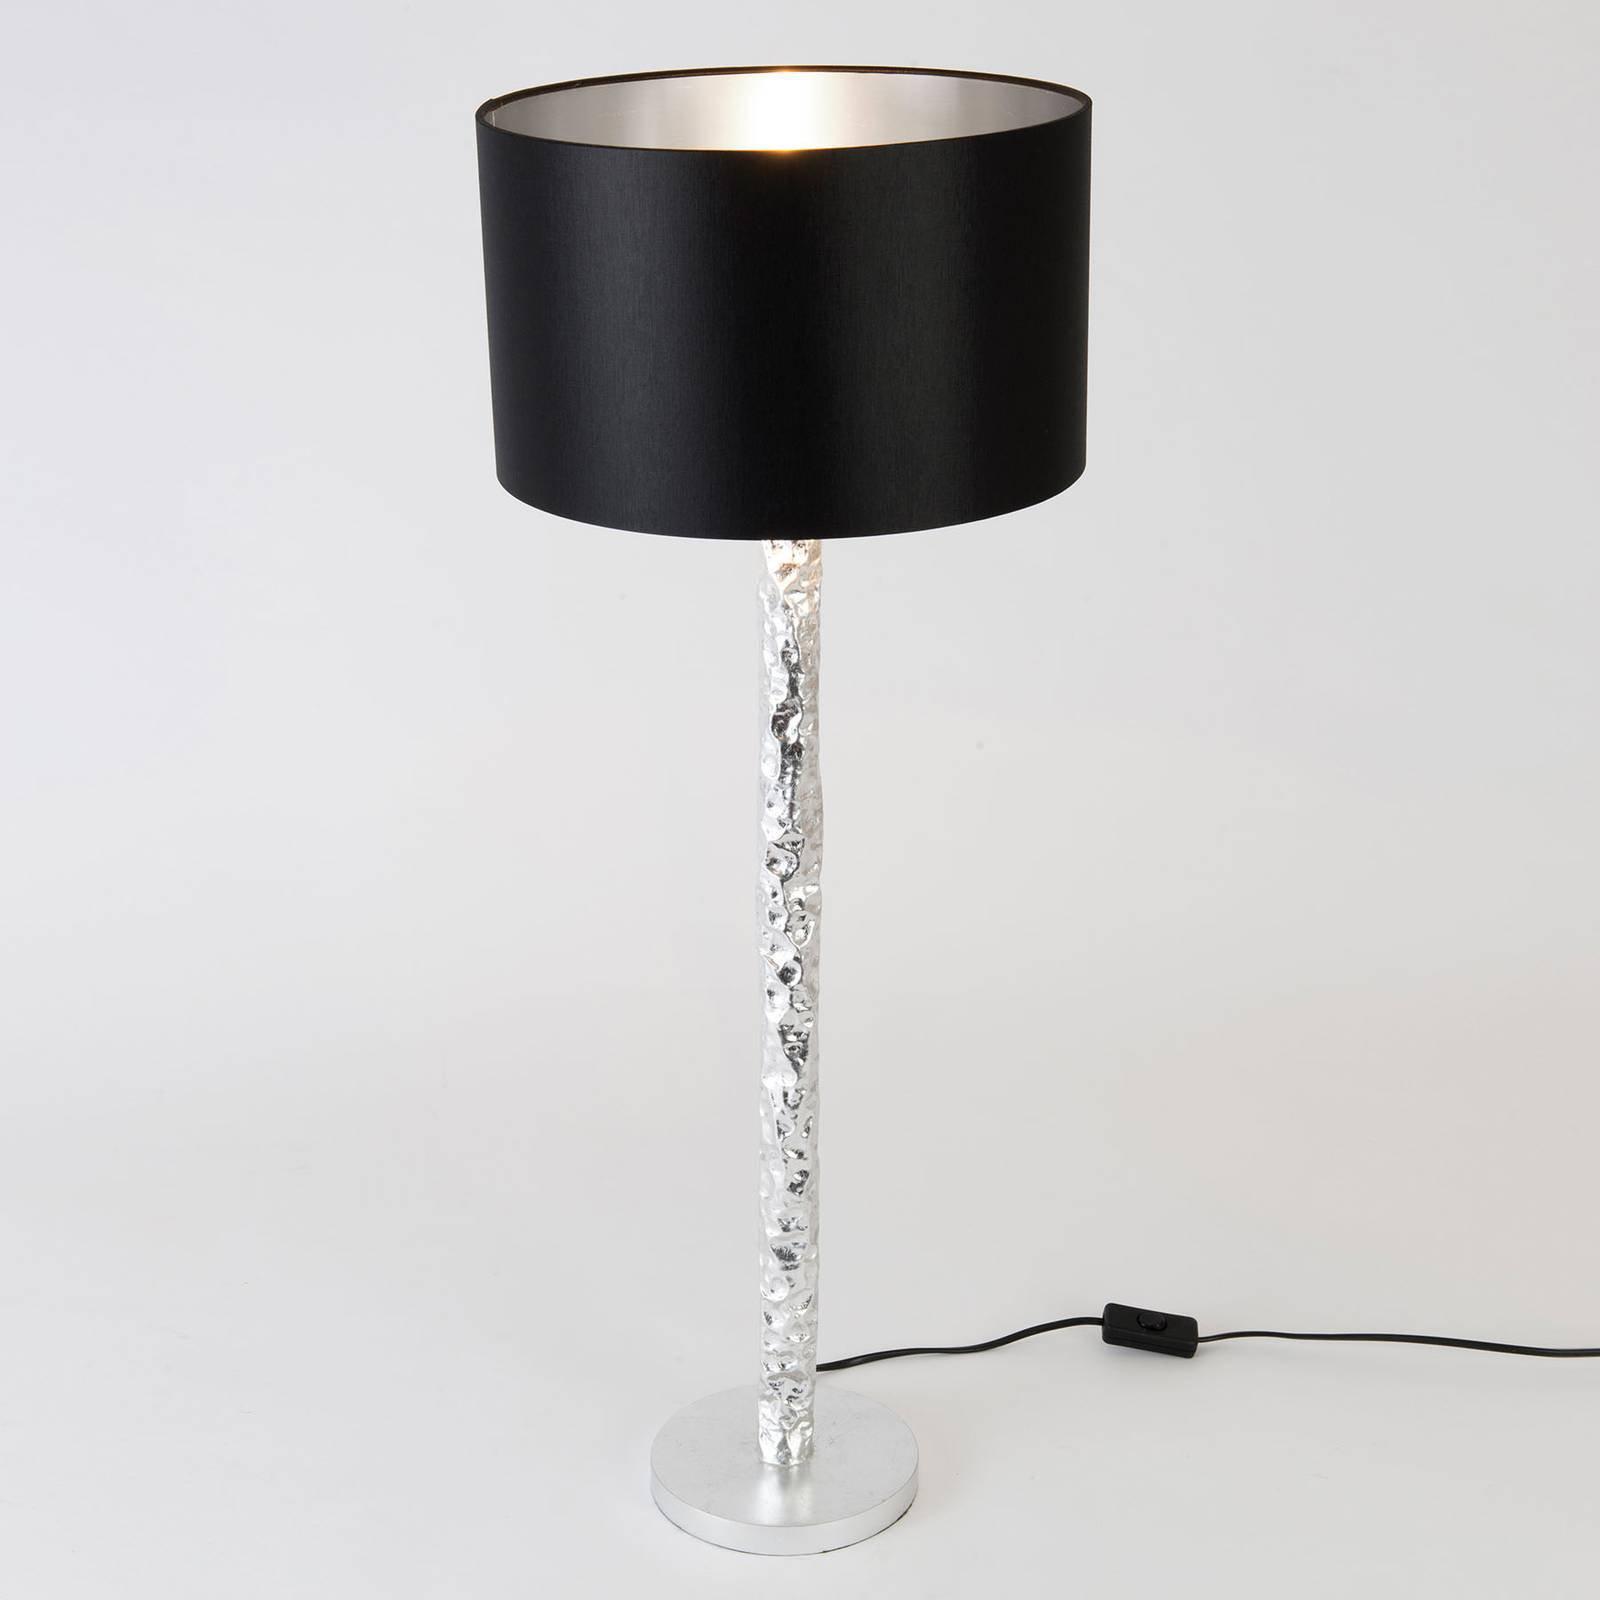 Bordlampe Cancelliere Rotonda, svart/sølv, 79 cm